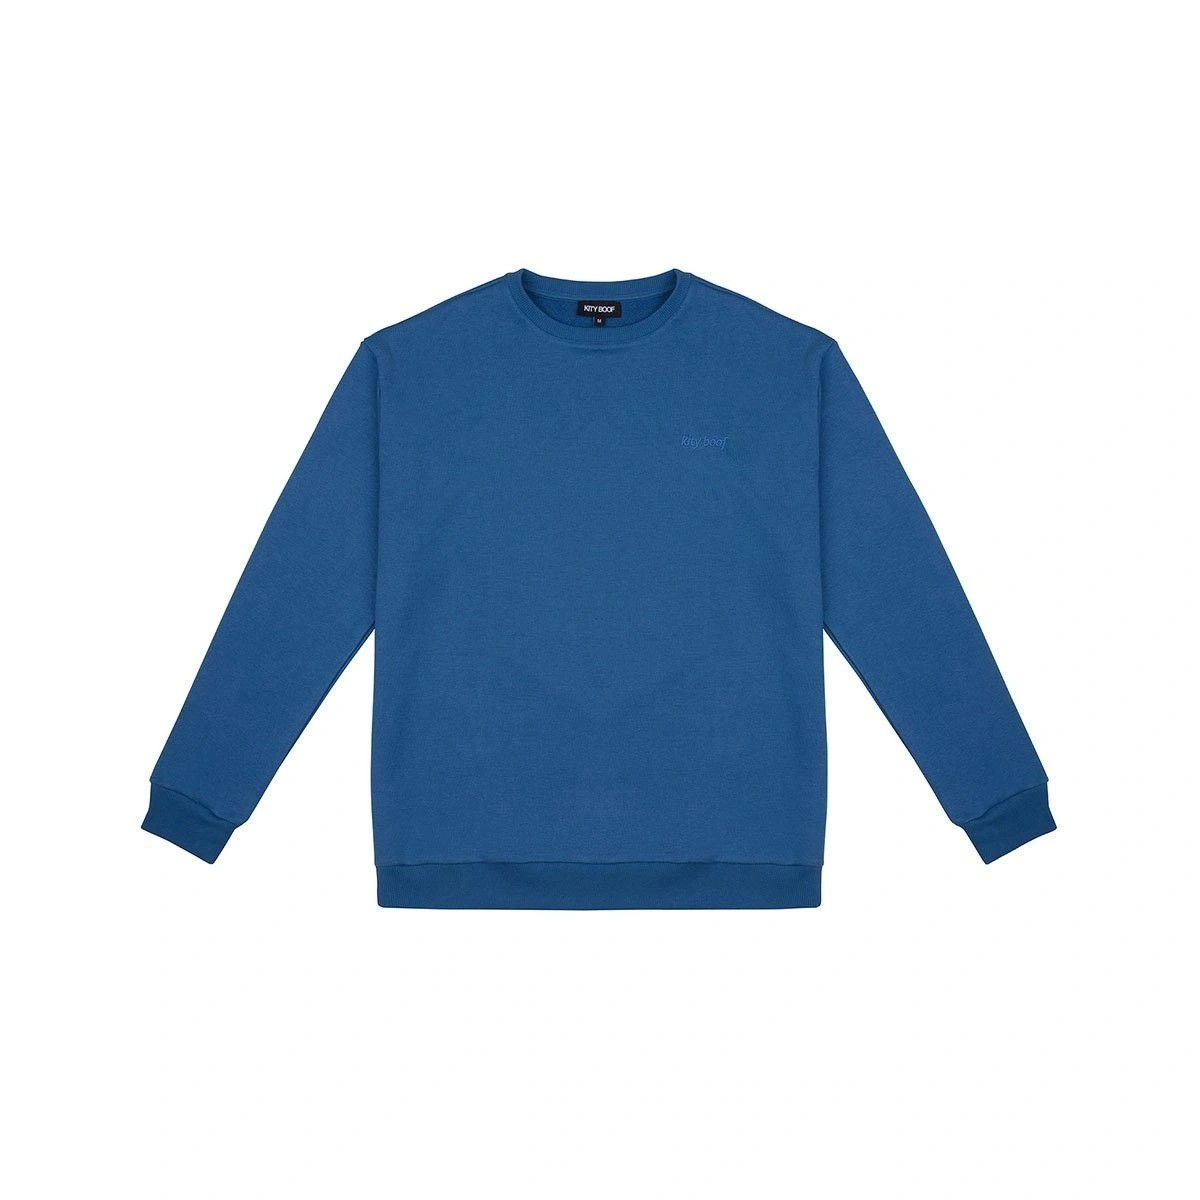 Kity Boof Sweatshirt Baby Blue